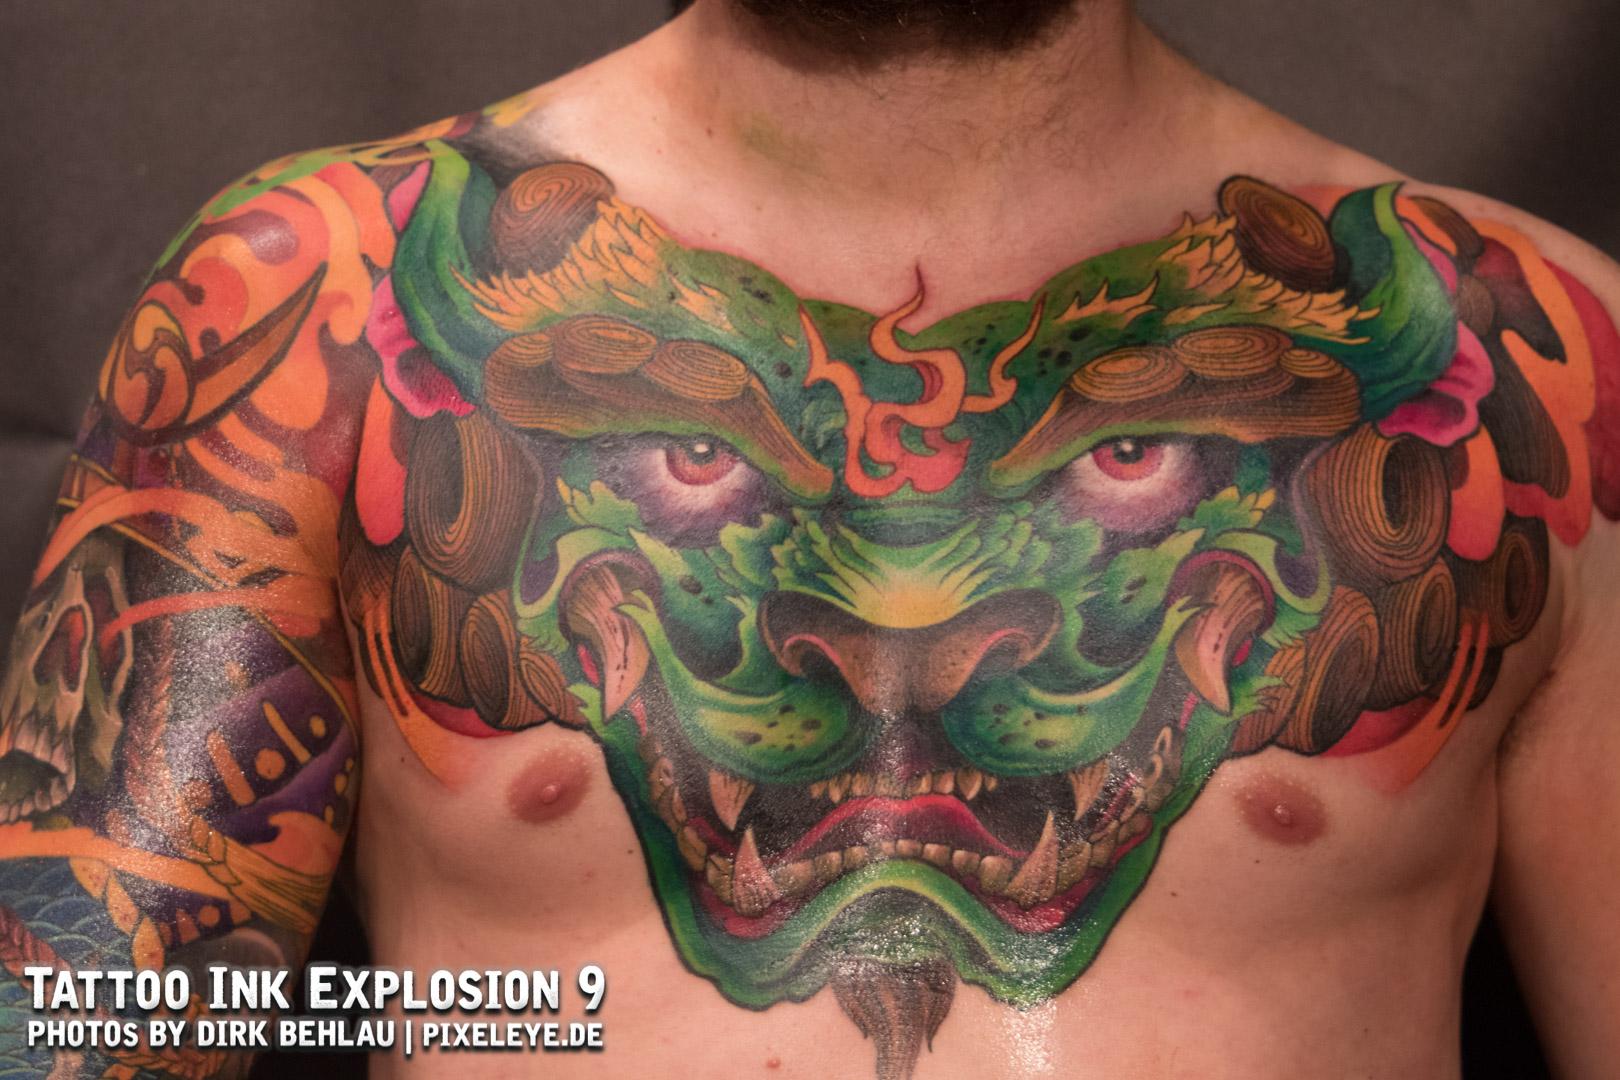 Tattoo Ink Explosion 2018 WEB by Dirk Behlau-0770.jpg